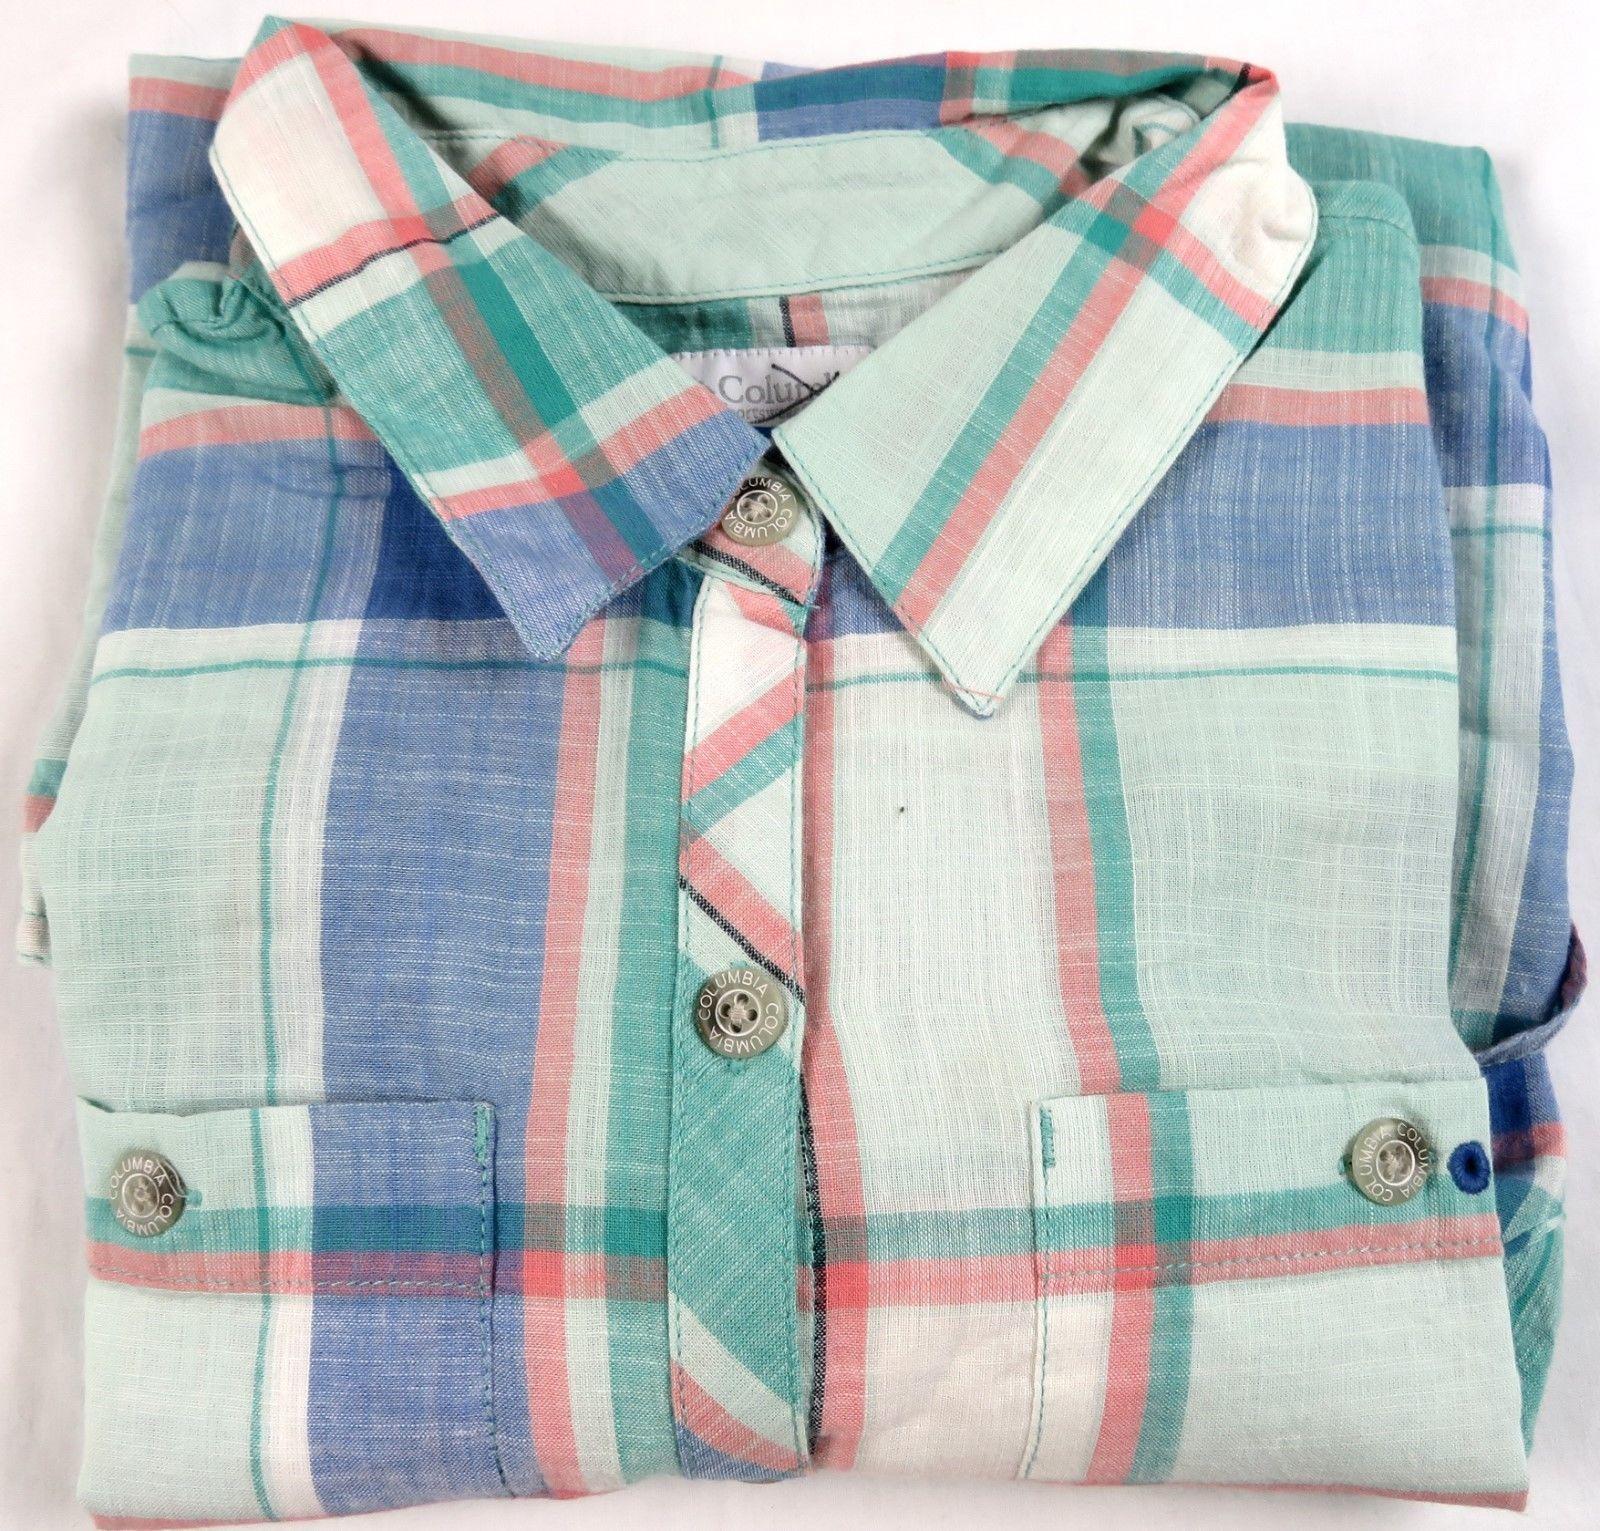 Columbia PFG Women's Shirt 2-pocket Long Sleeve Woven Button Down Lime Plaid